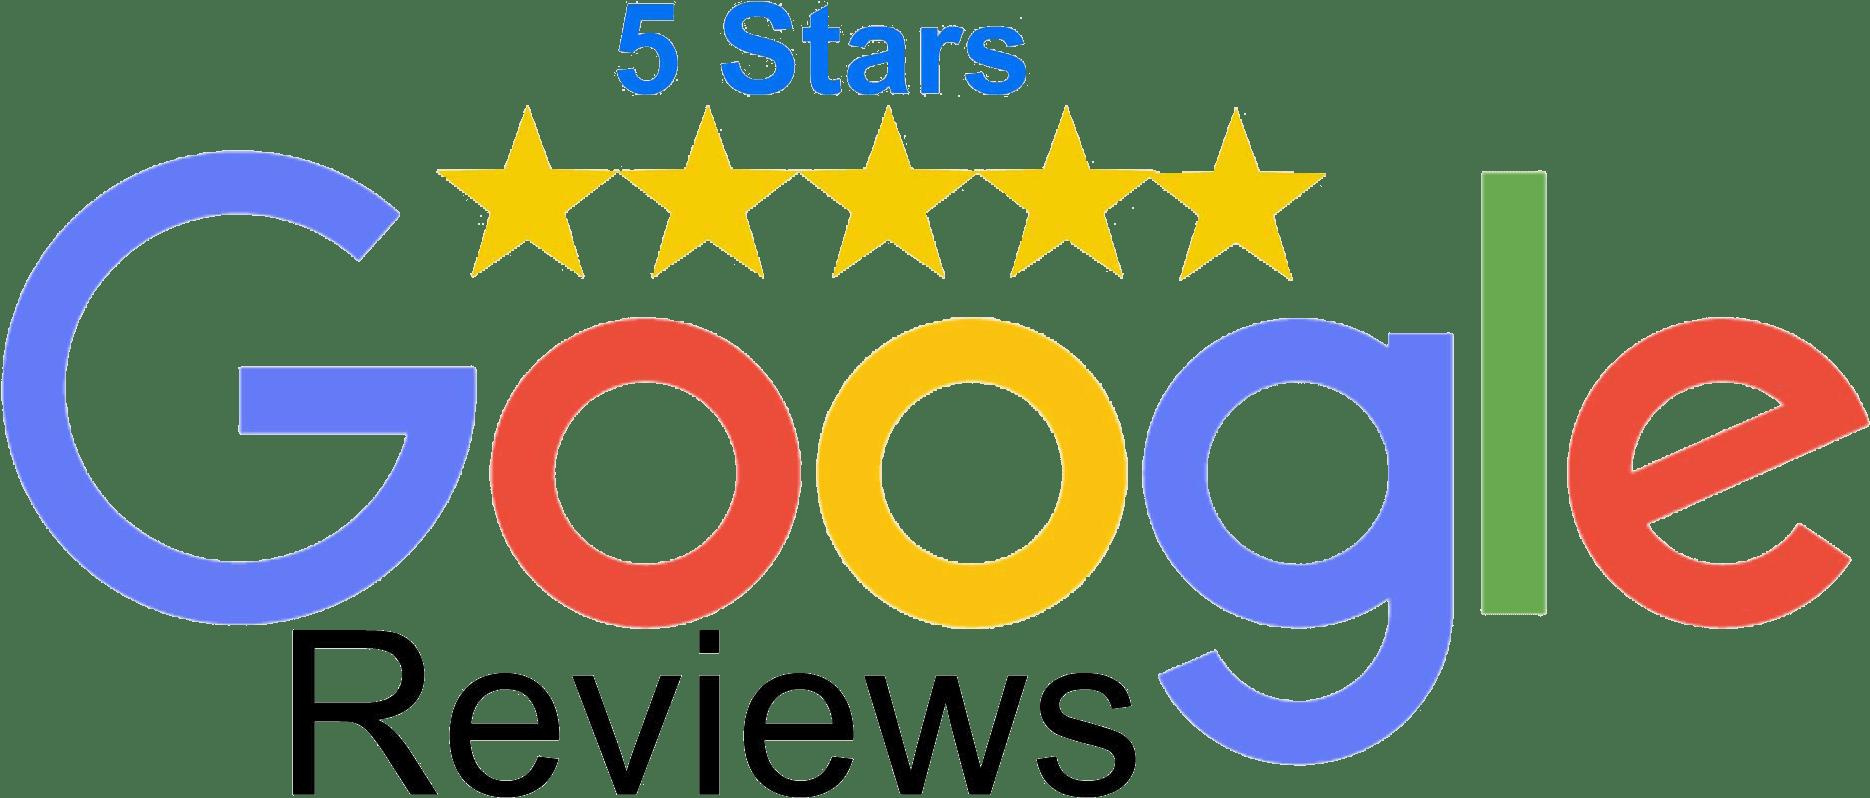 5 star google rating